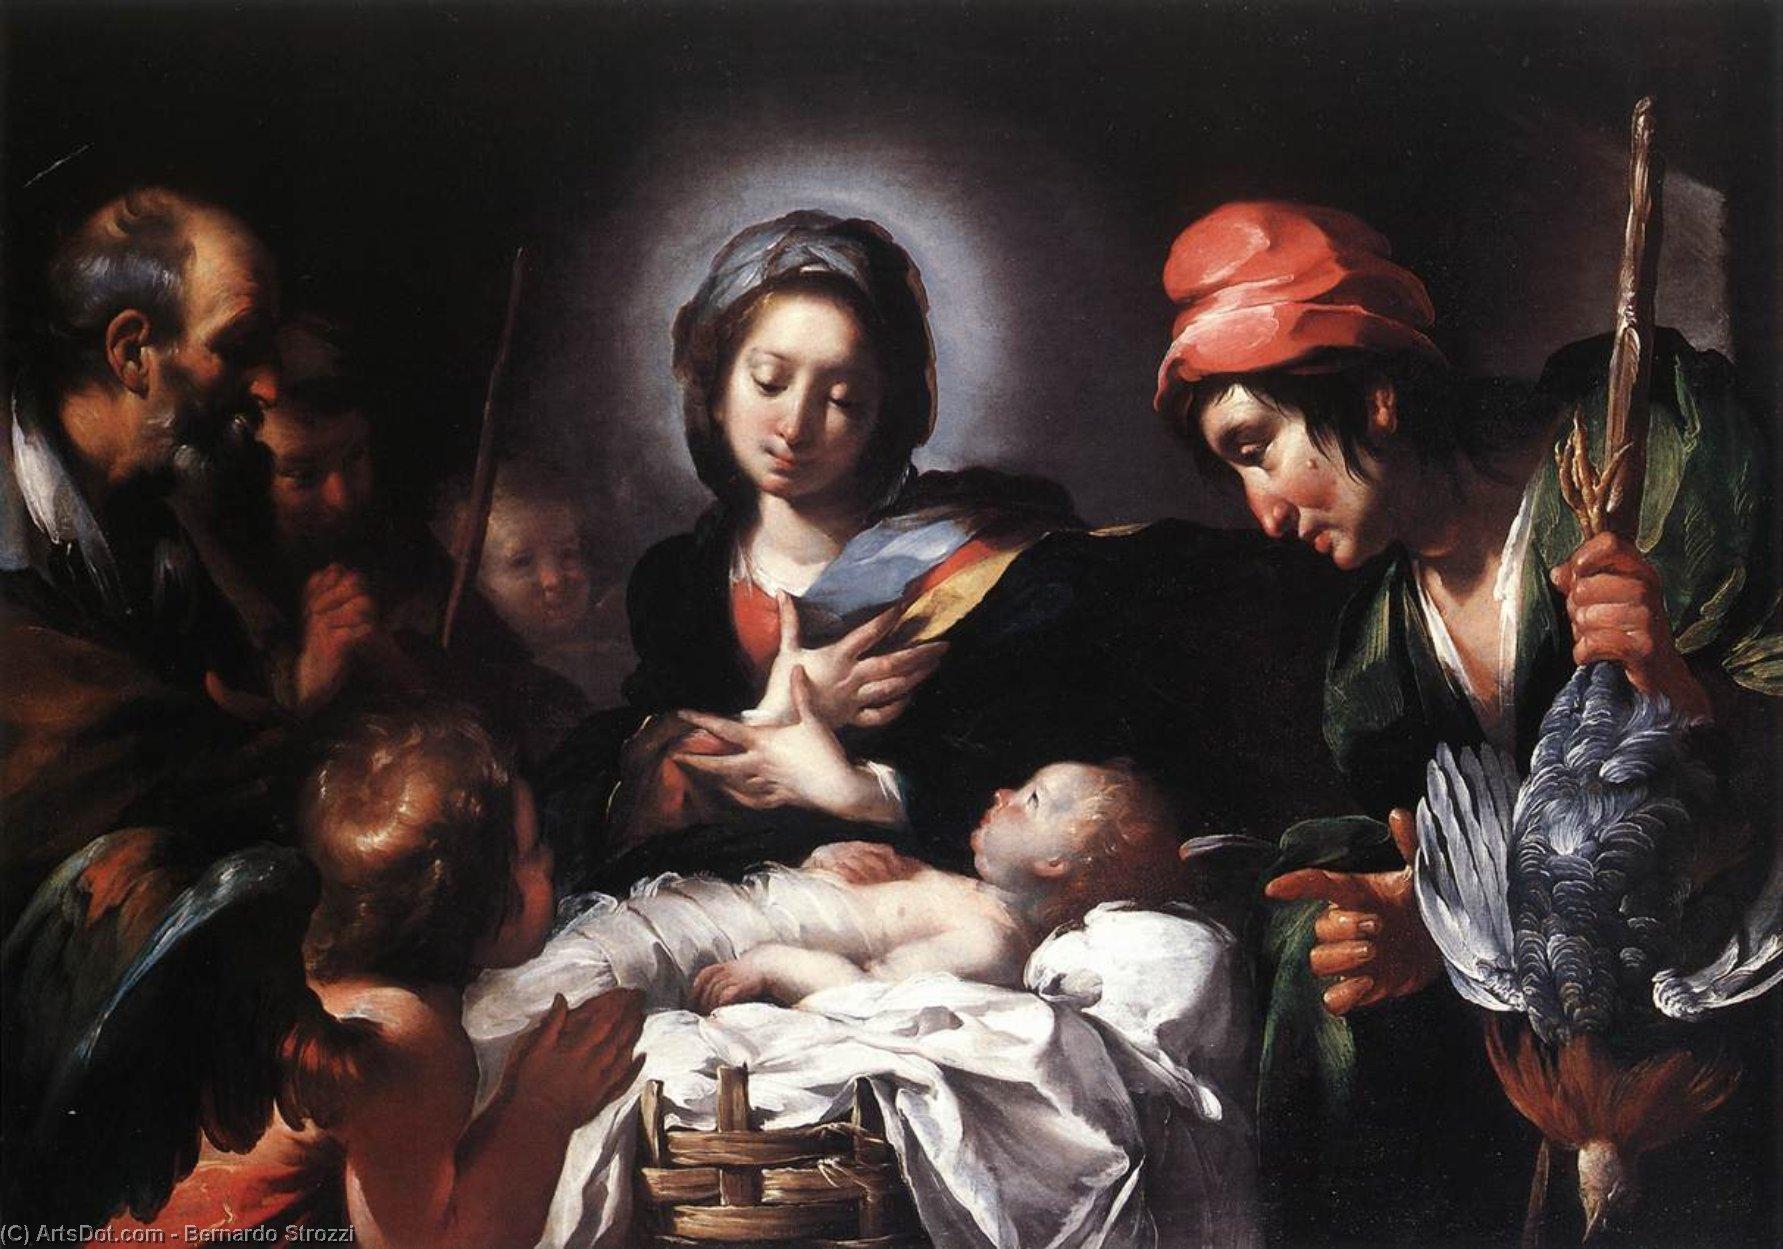 Wikioo.org - The Encyclopedia of Fine Arts - Painting, Artwork by Bernardo Strozzi - Adoration of the Shepherds